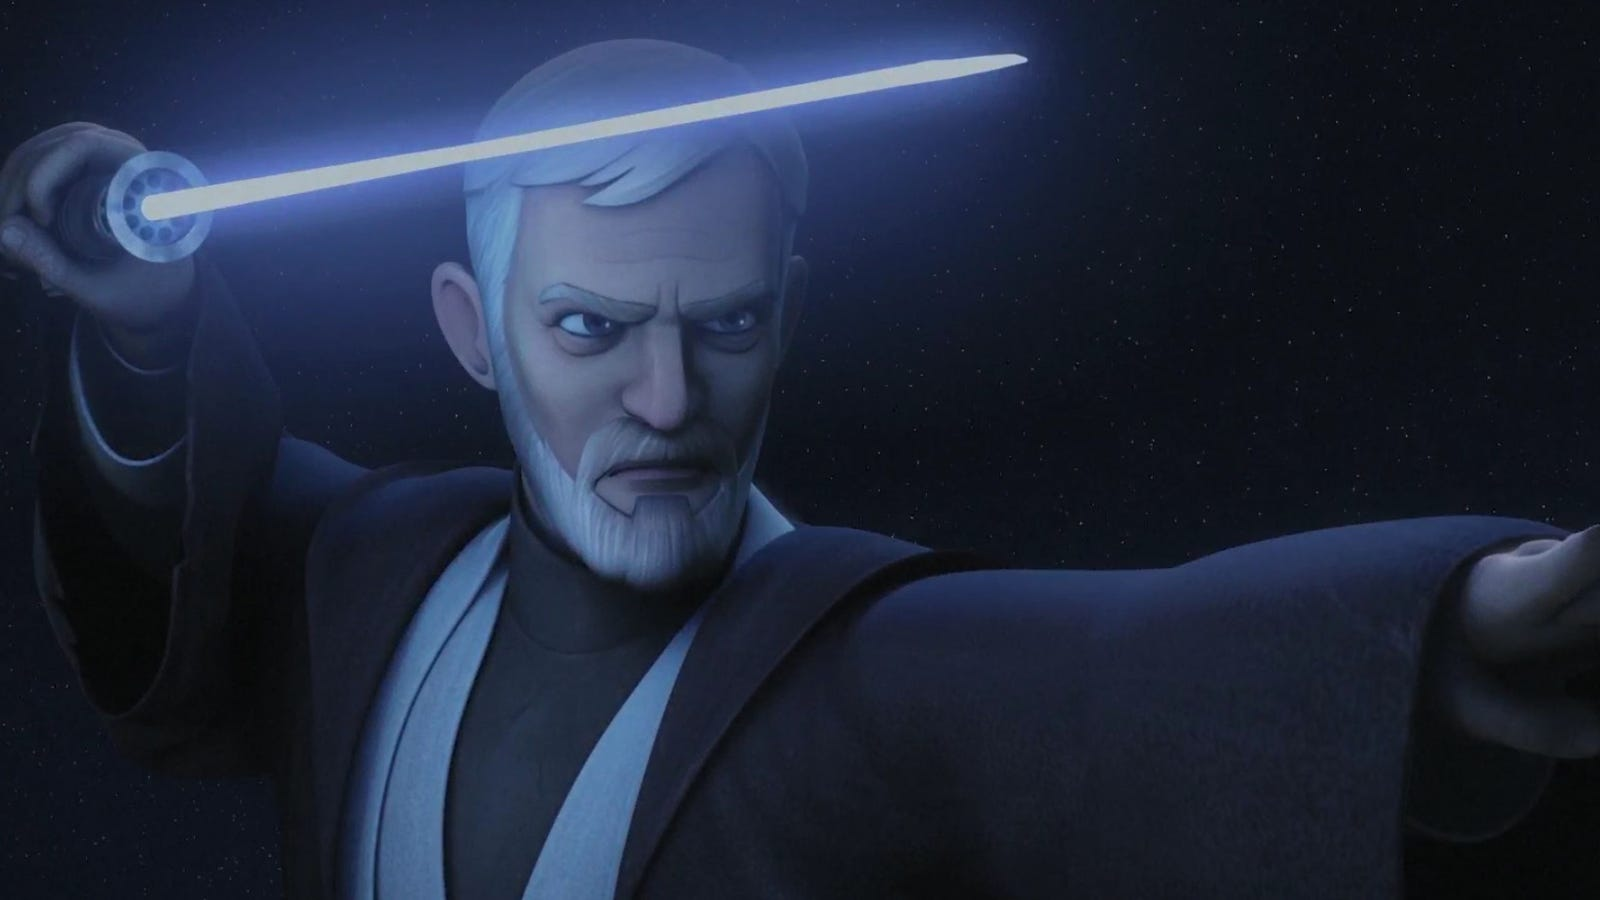 Obi-Wan Kenobi and Darth Maul Are Getting a Rematch on Star Wars Rebels